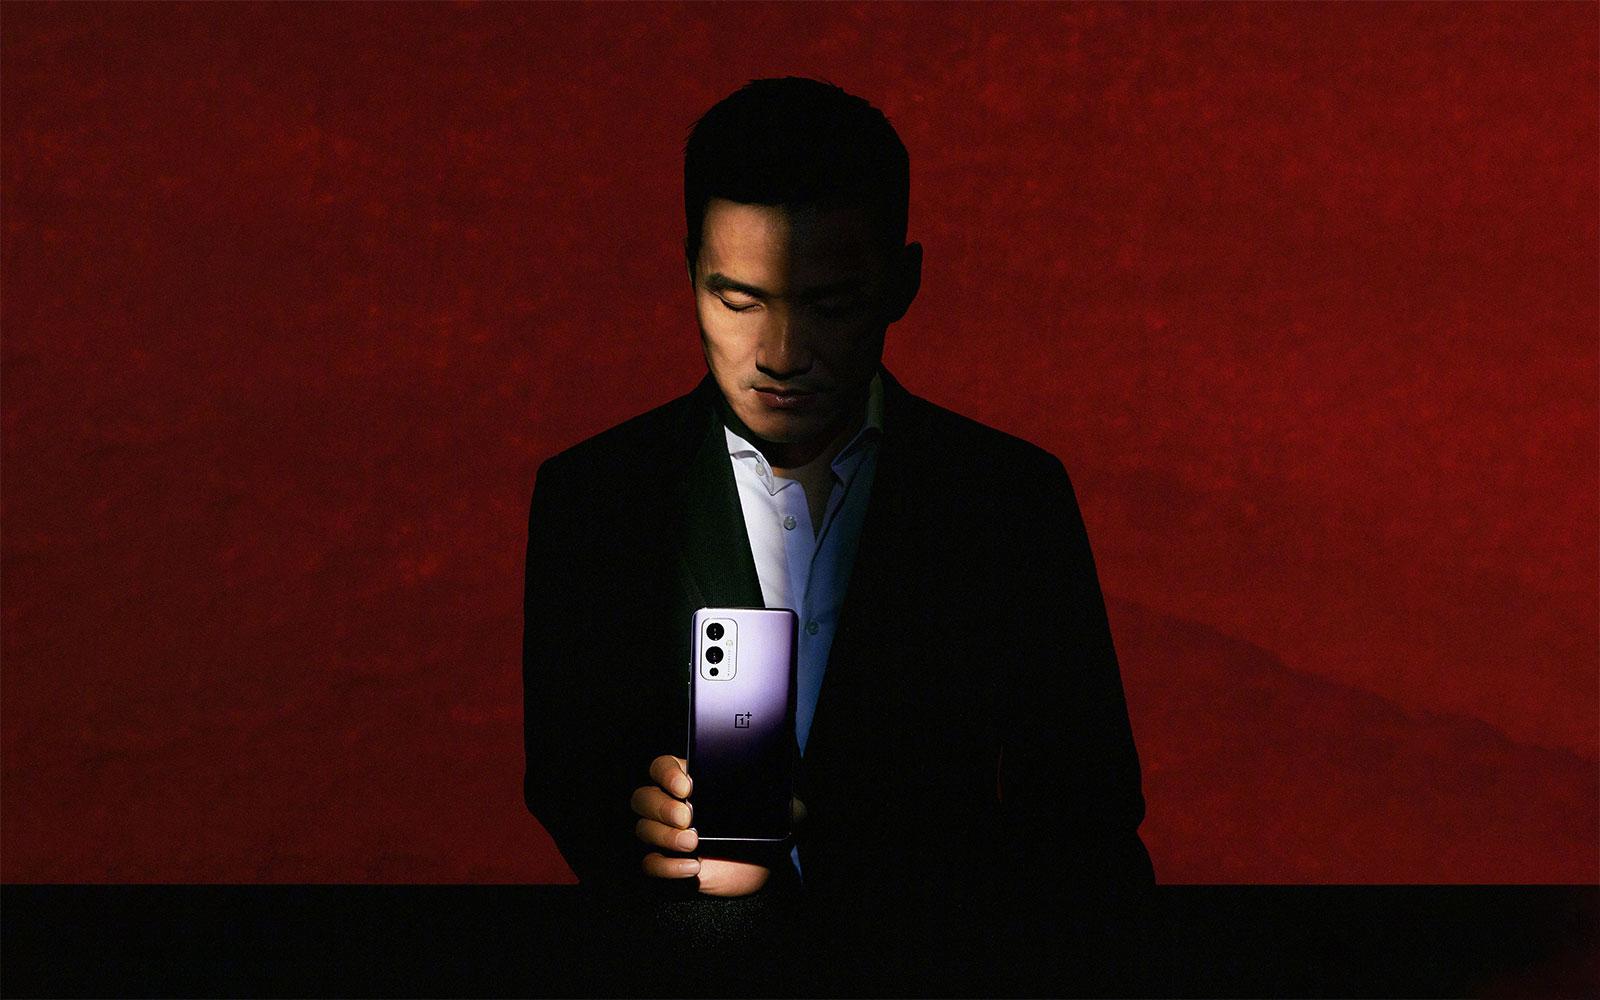 OnePlus founder Pete Lau